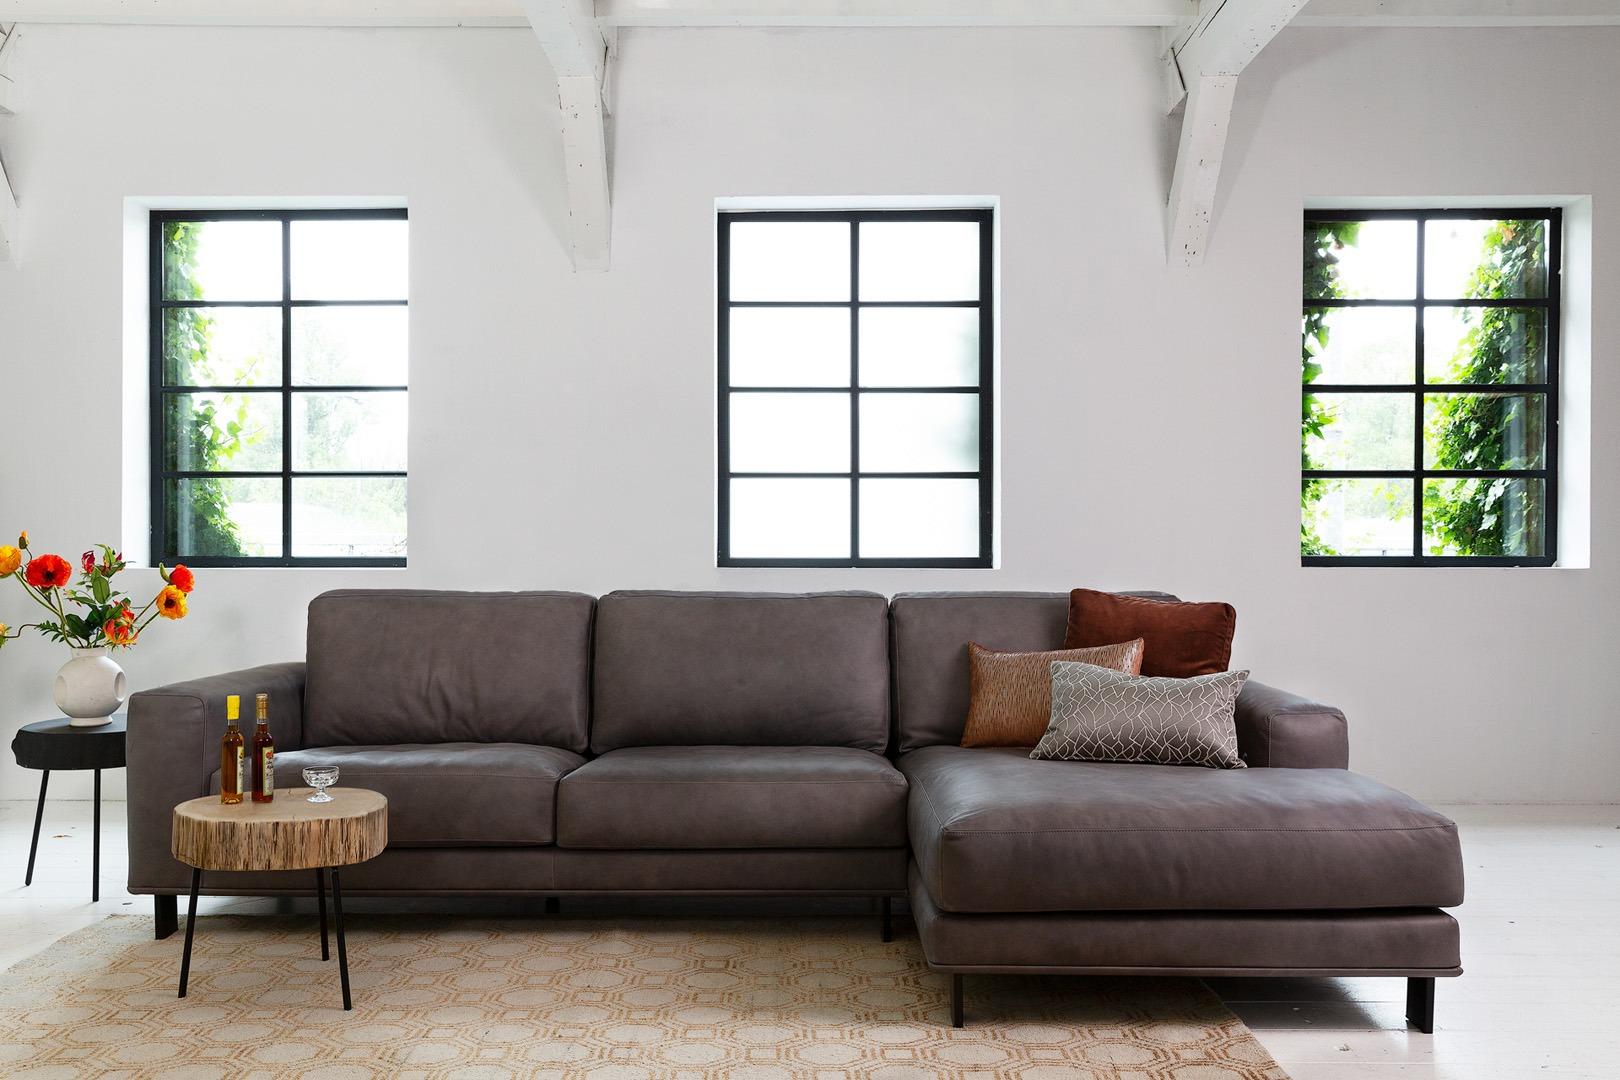 cuba-intense-longchair-hoekbank-grijs-leer-soofs-interieur-12 (1)